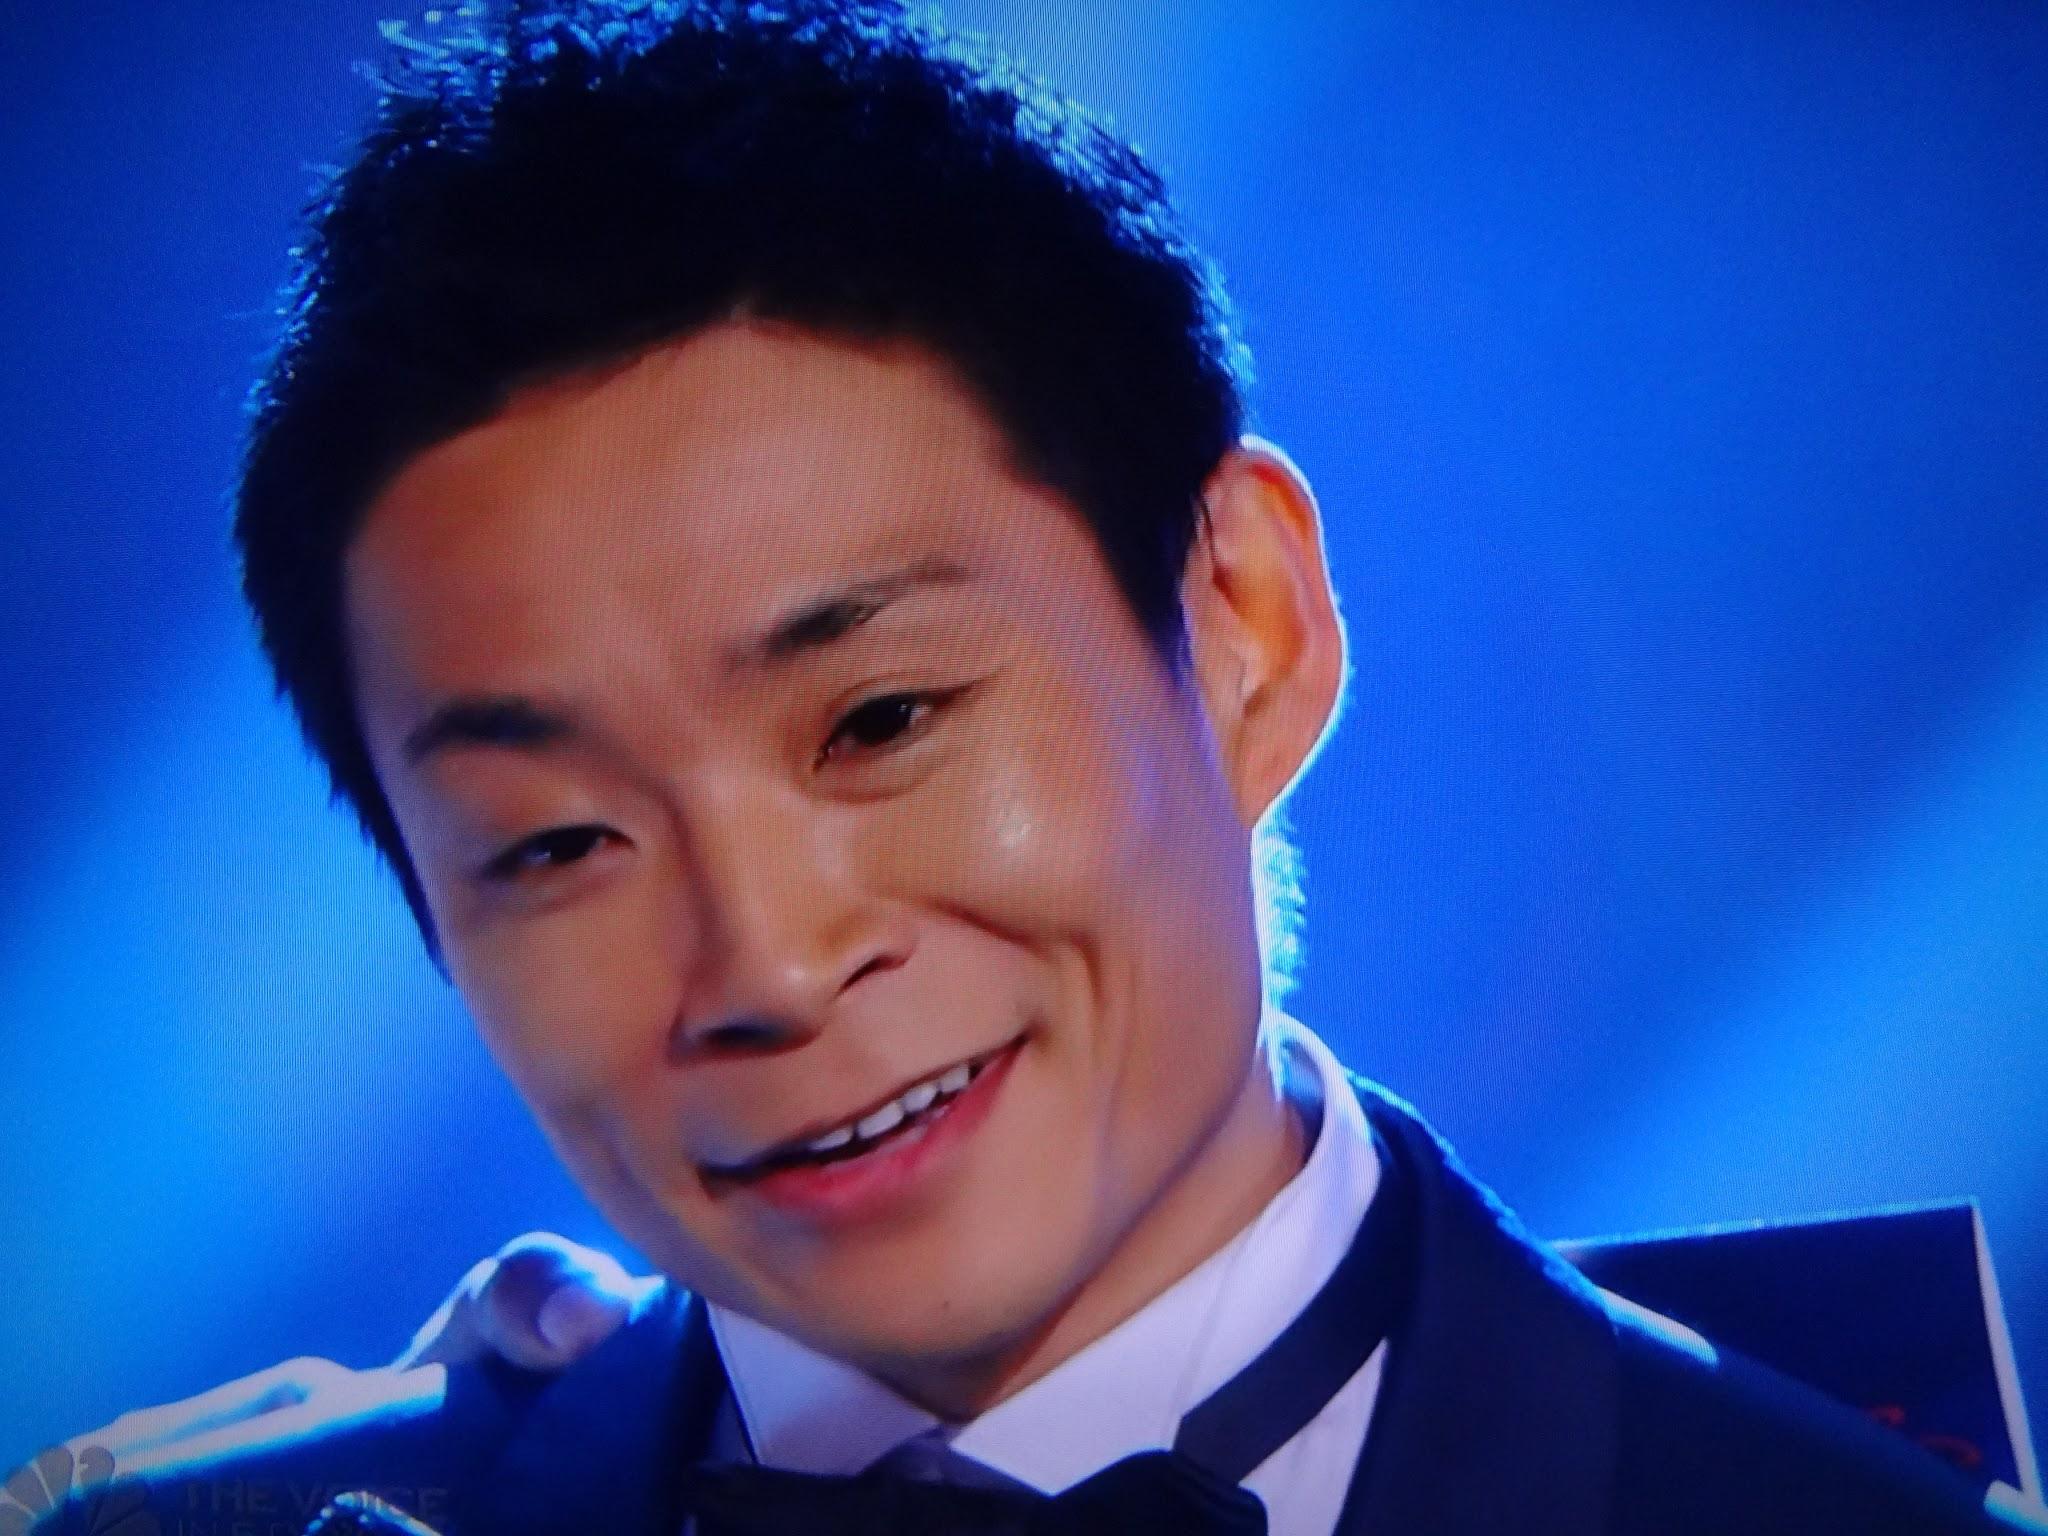 America's Got Talent 2013 Winner